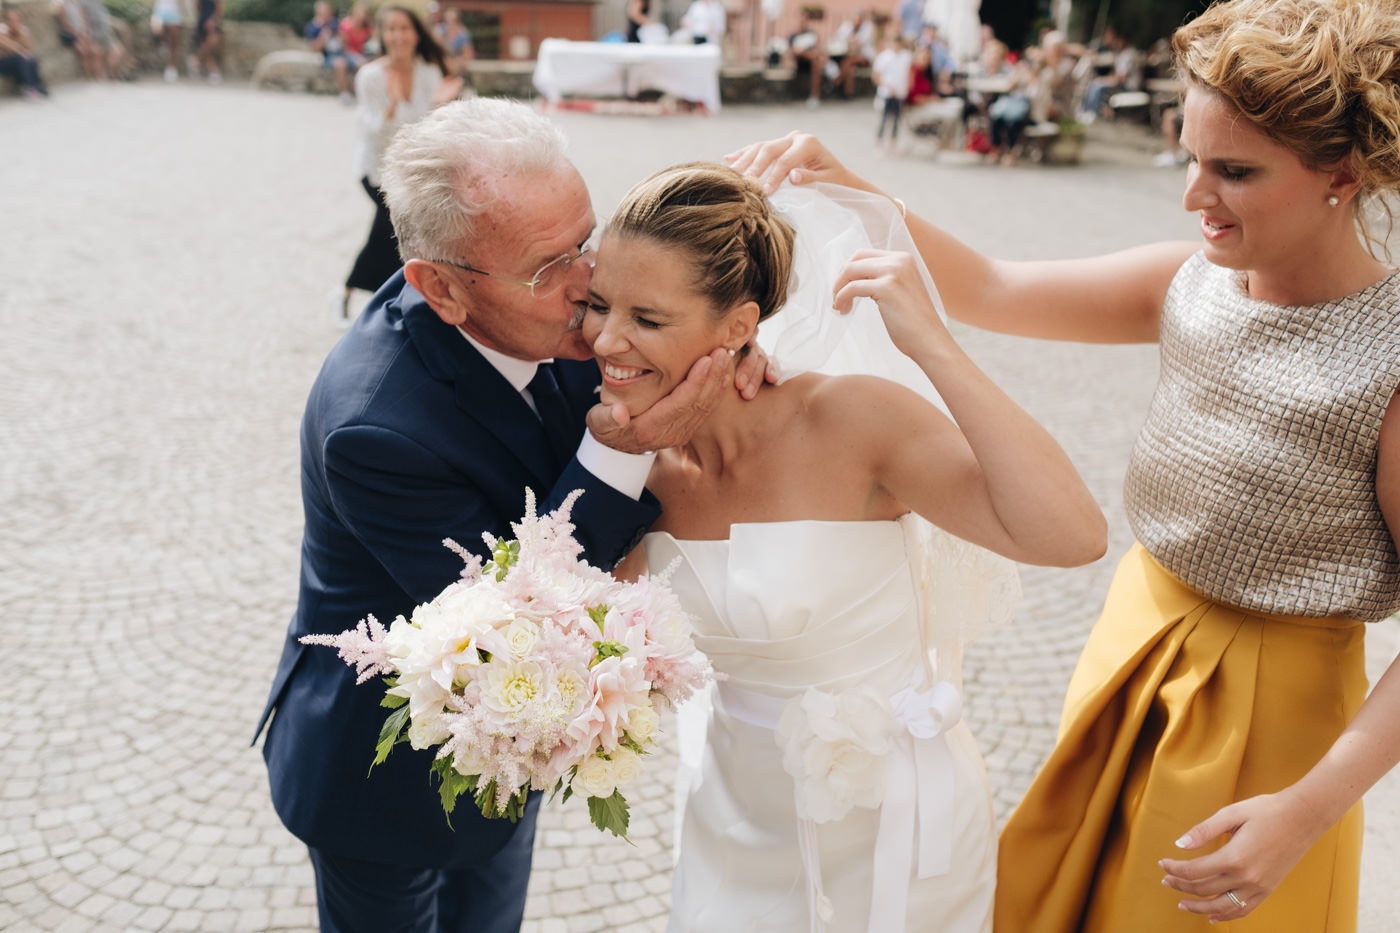 matrimoni_all_italiana_fotografo_matrimonio_cinque_terre-25.jpg